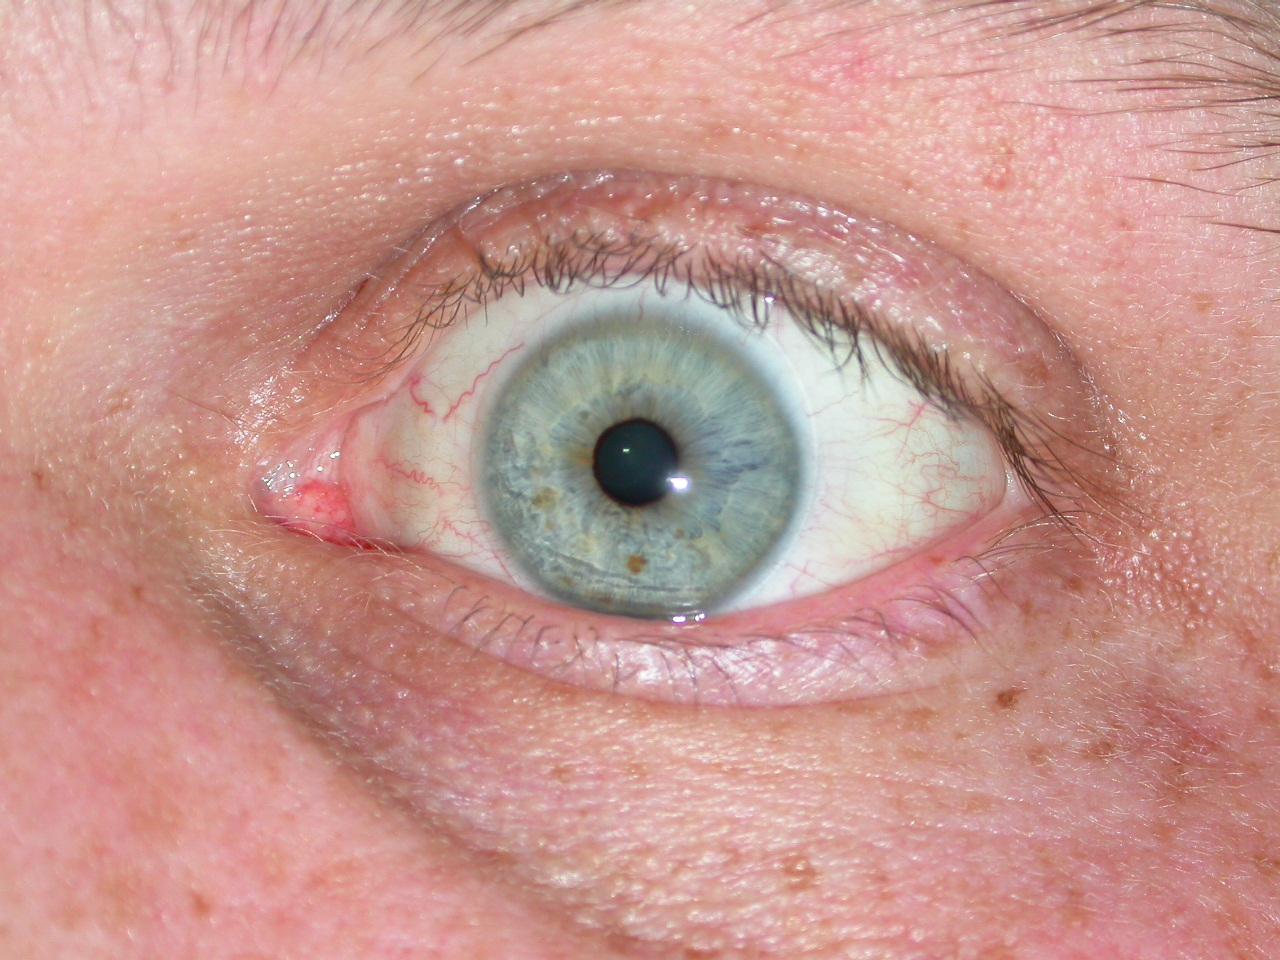 Eye photo